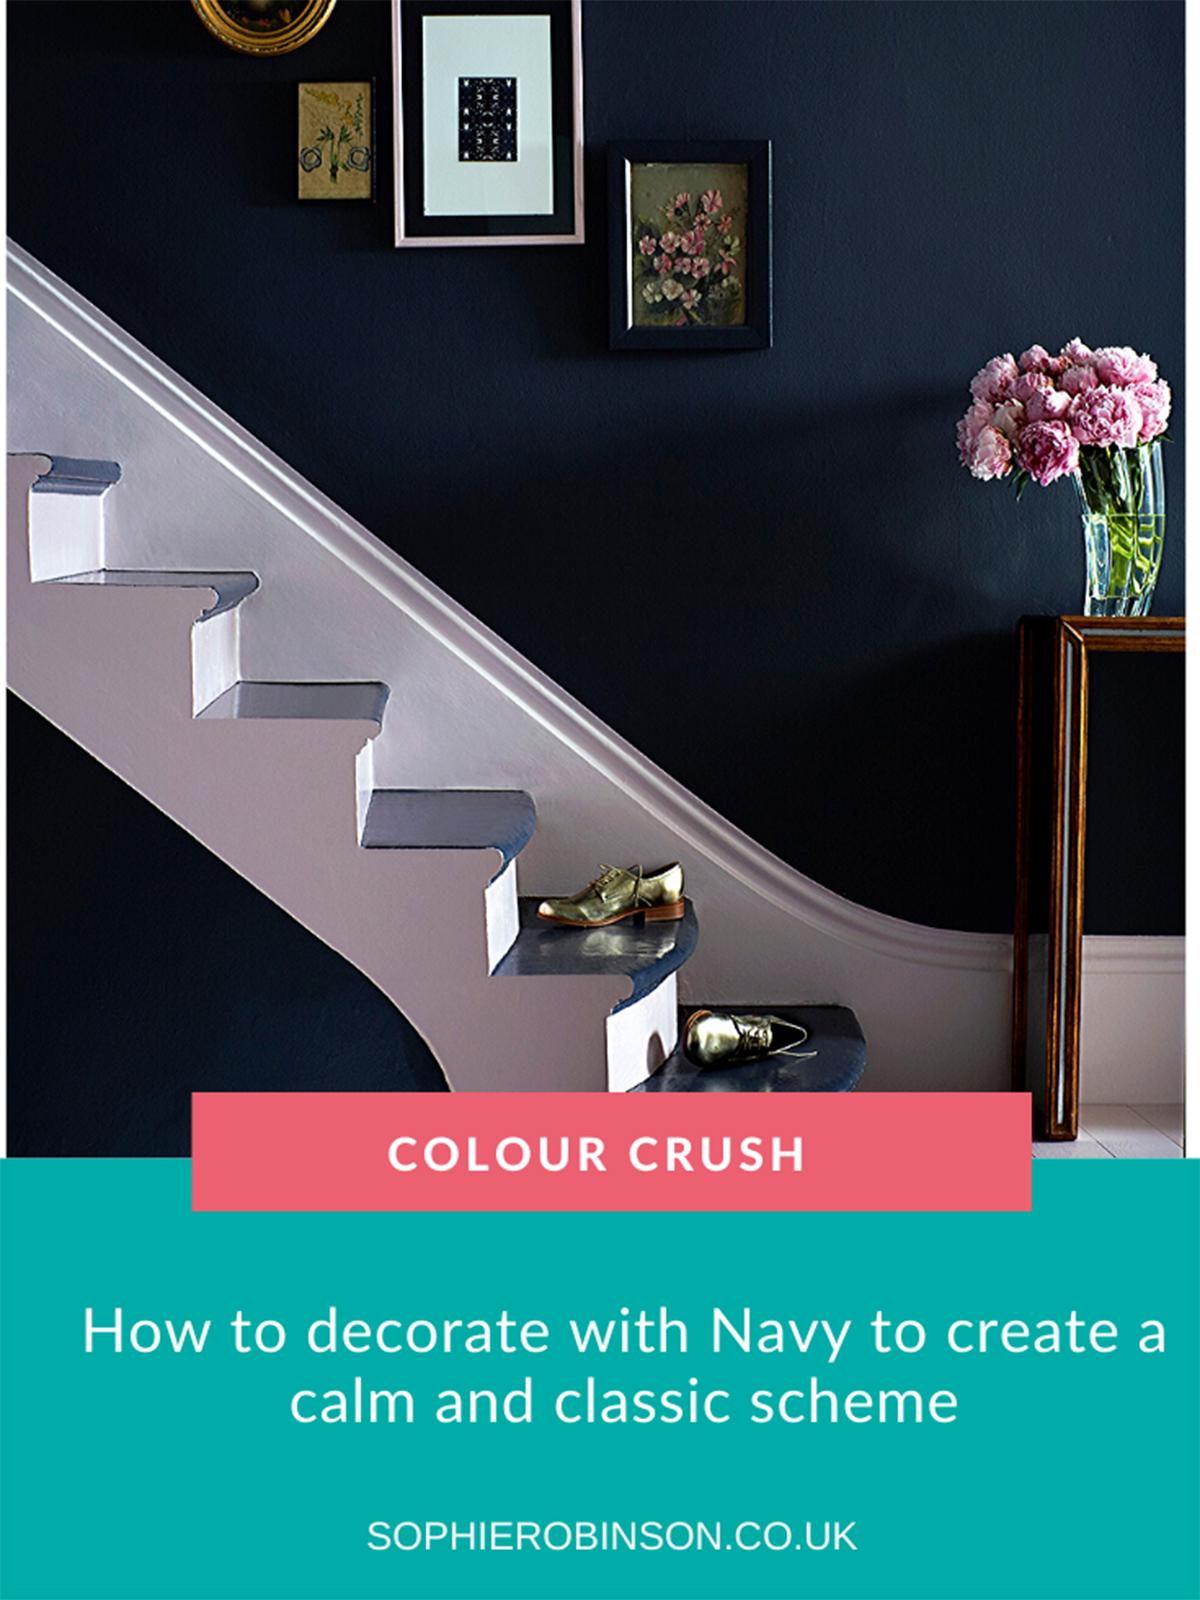 Interior Designer Sophie Robinson looks at ways of introducing navy to an interior scheme. #navy #sophierobinson #colourcrush